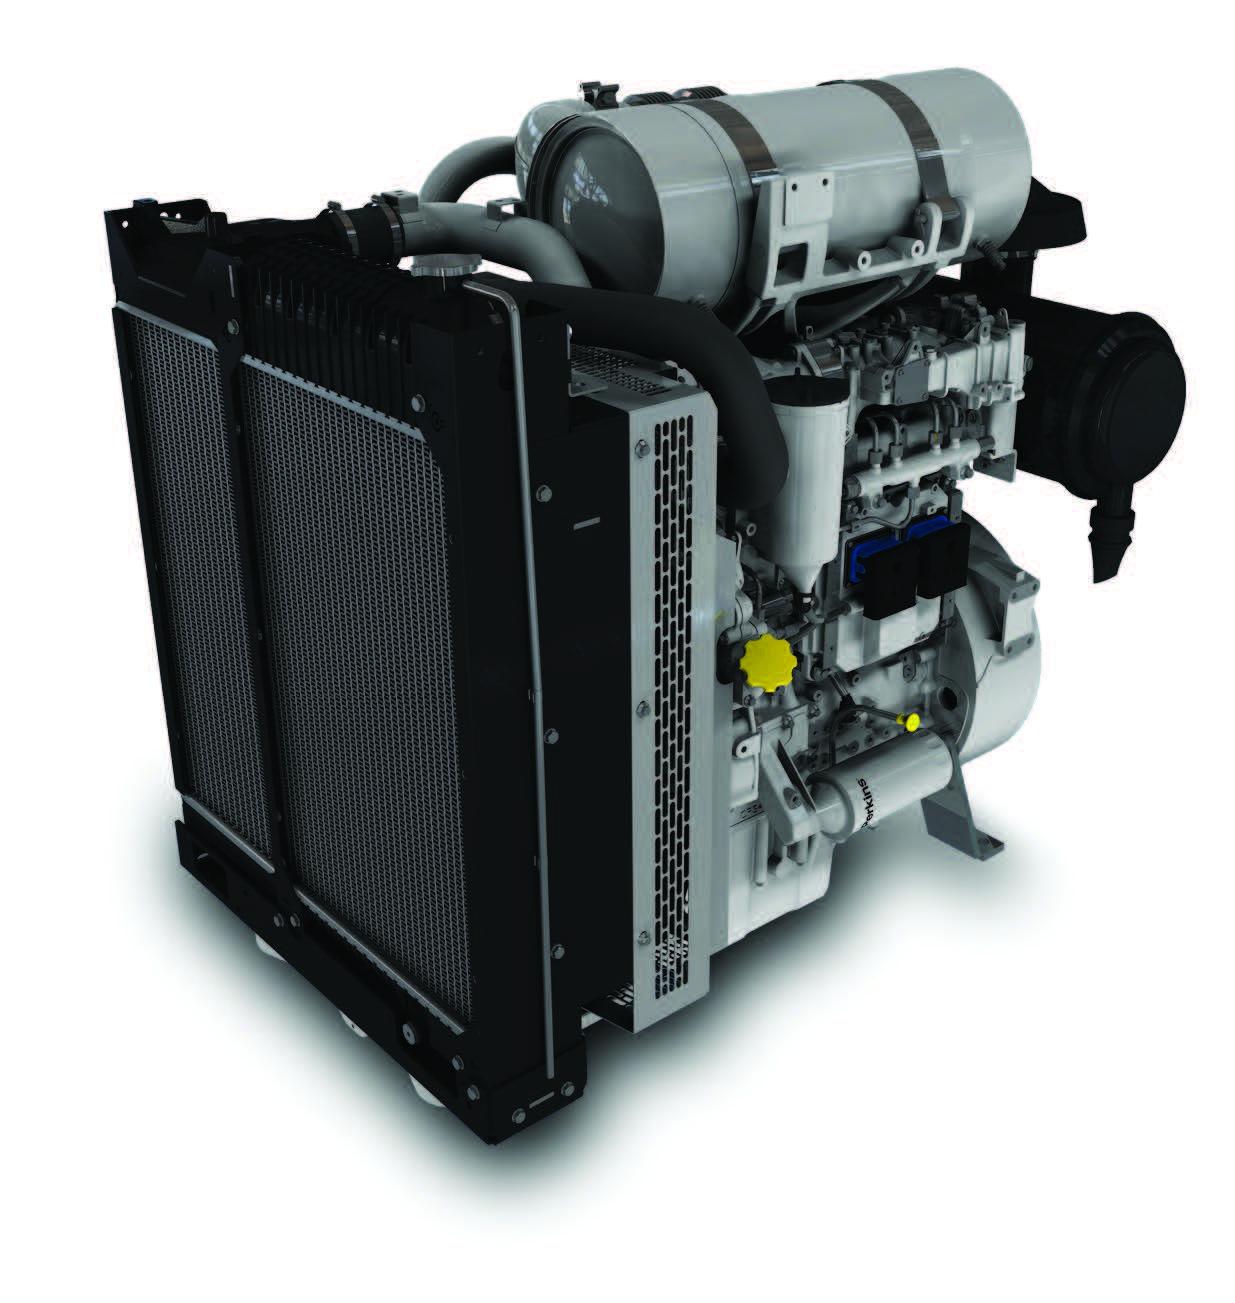 1204E-E44TTAG2 Diesel Engine – ElectropaK